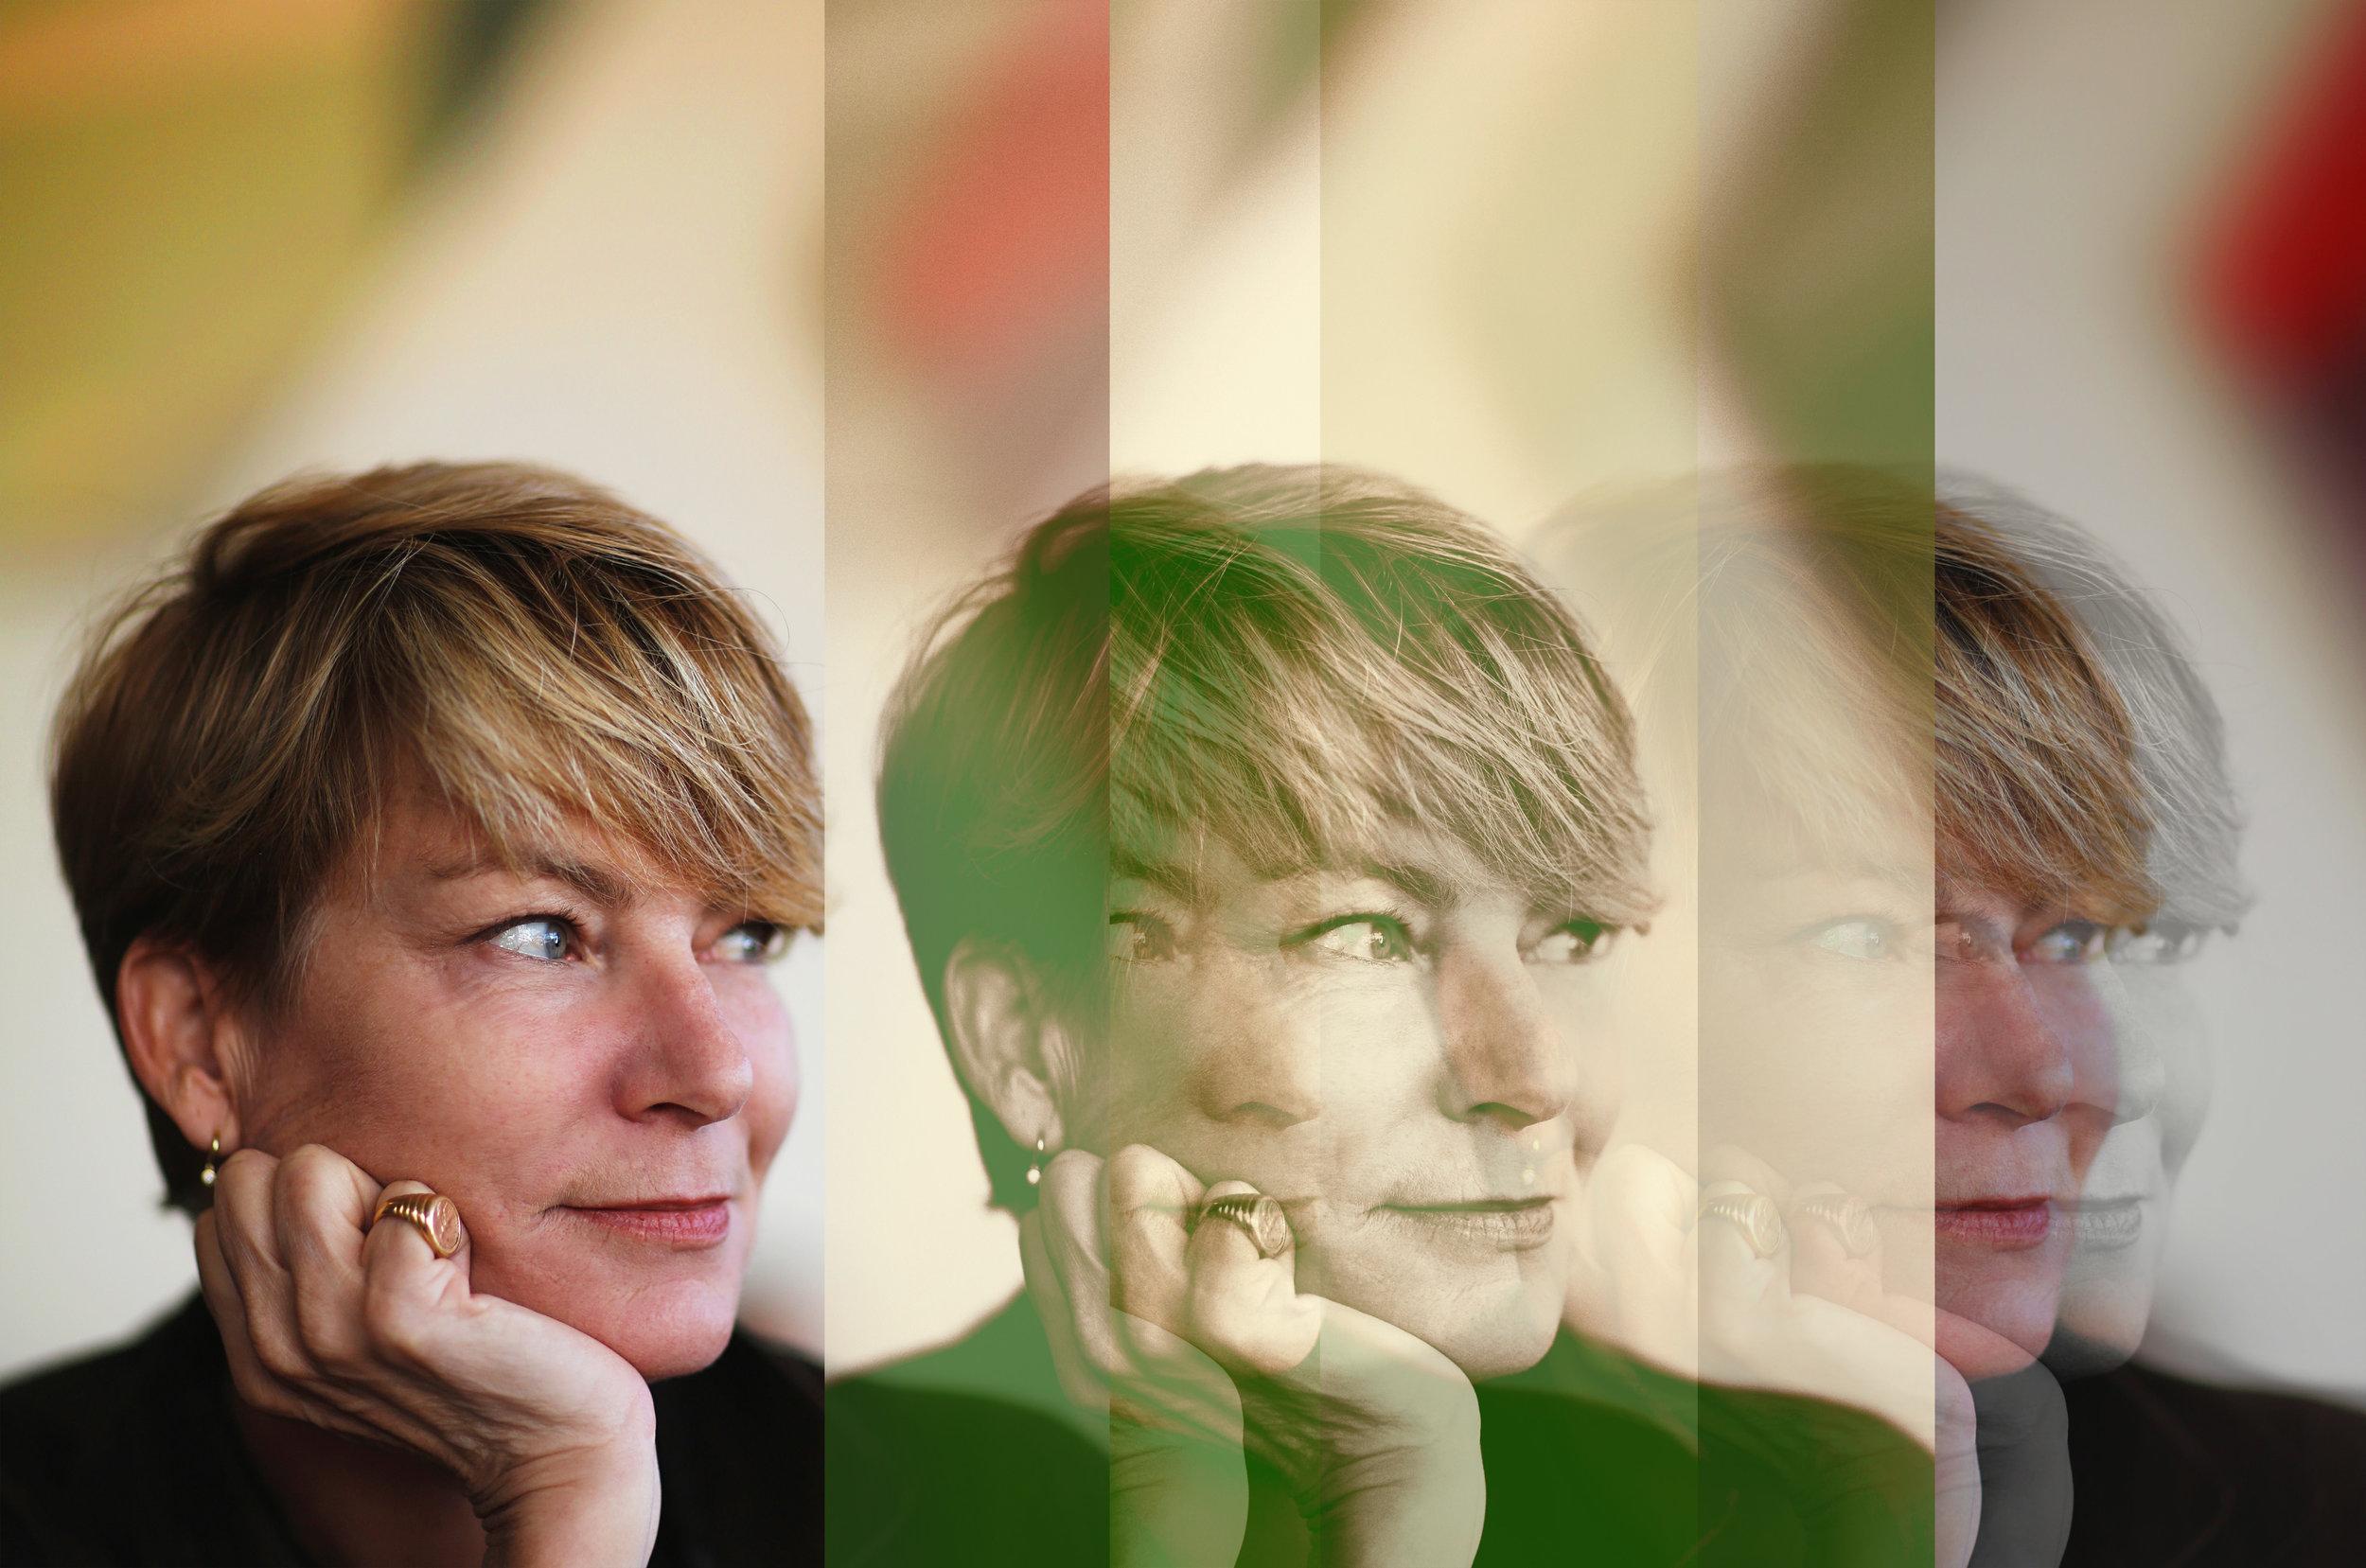 Architect, Covert Activist, Women Advocate, Philanthropist, San